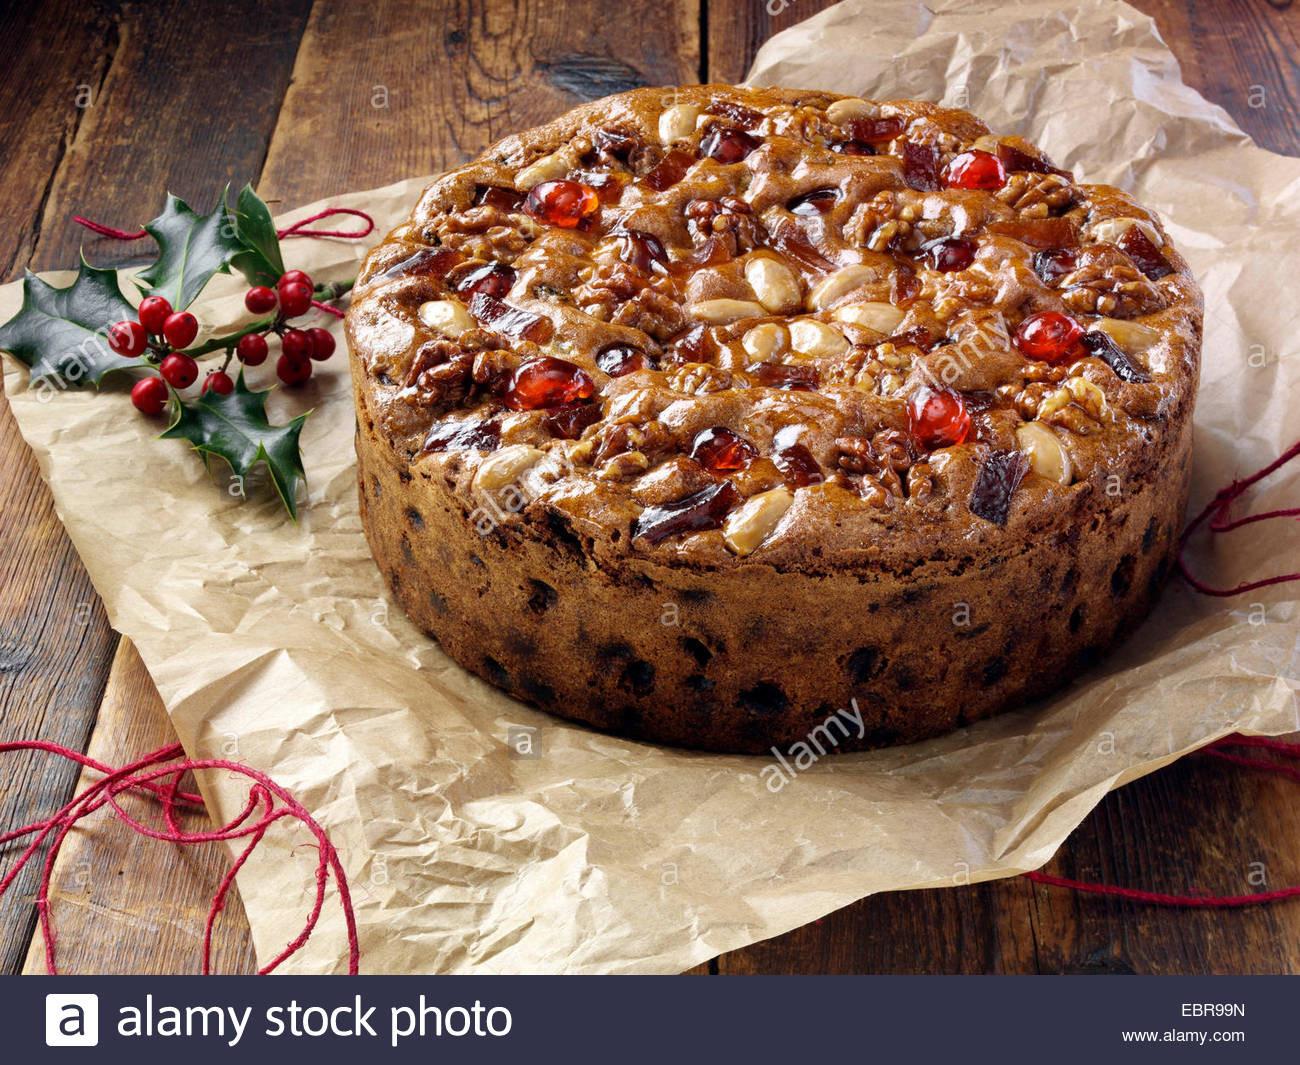 Mary Berry Christmas Cakes  Mary Berry Genoa fruit cake for Christmas Stock